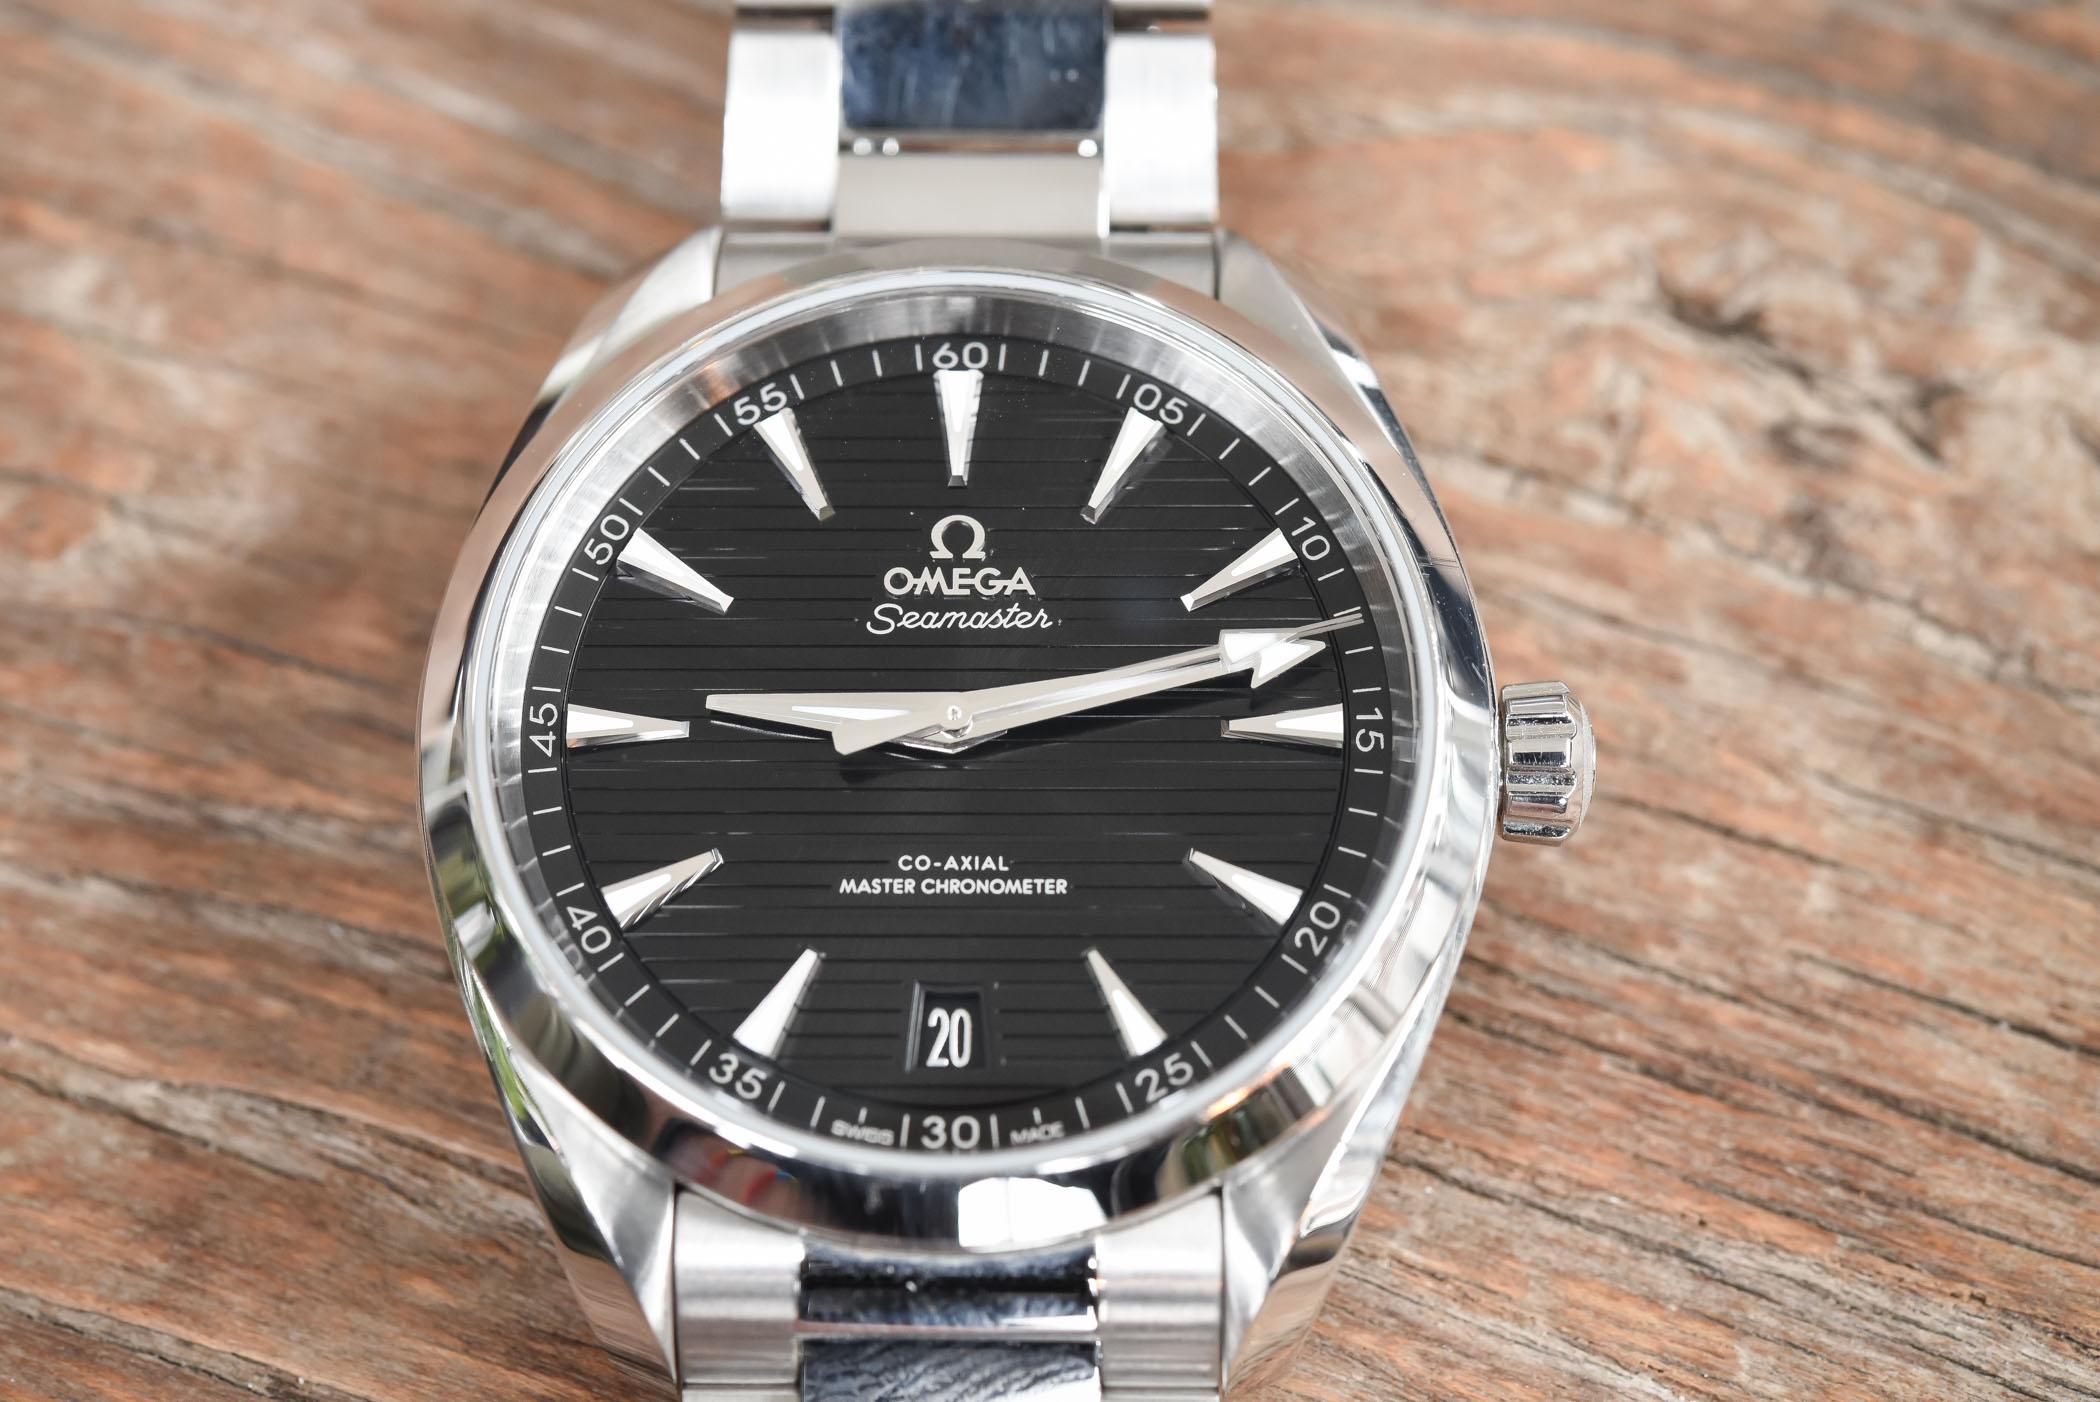 8d93c14ff64 Review - Omega Seamaster Aqua Terra 150m 41mm (Specs   Price)